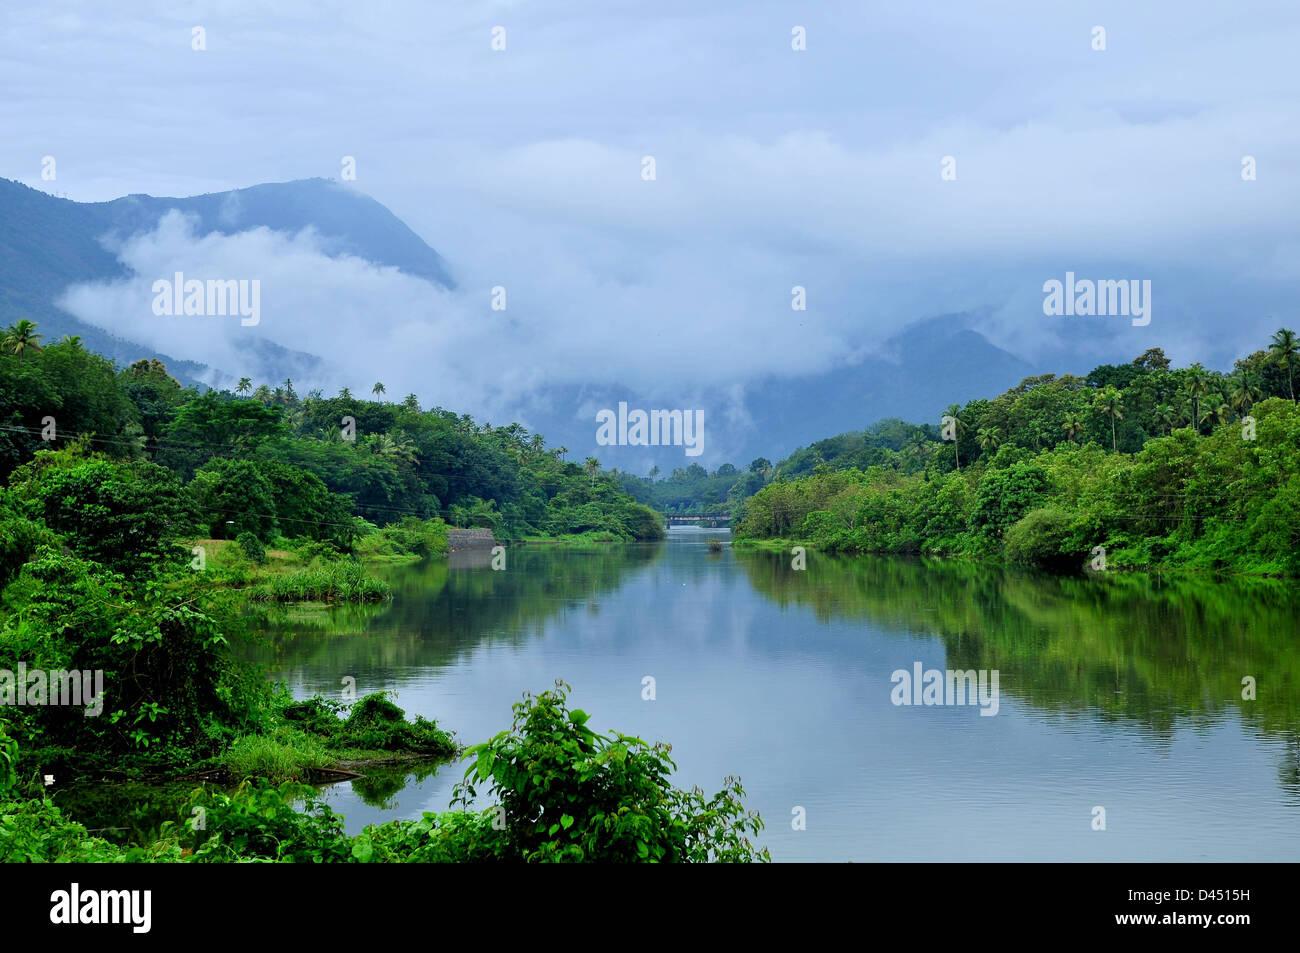 Moolamattom is the headquarters of Arakulam Panchayath in Thodupuzha Taluk, Idukki district in Kerala, India - Stock Image